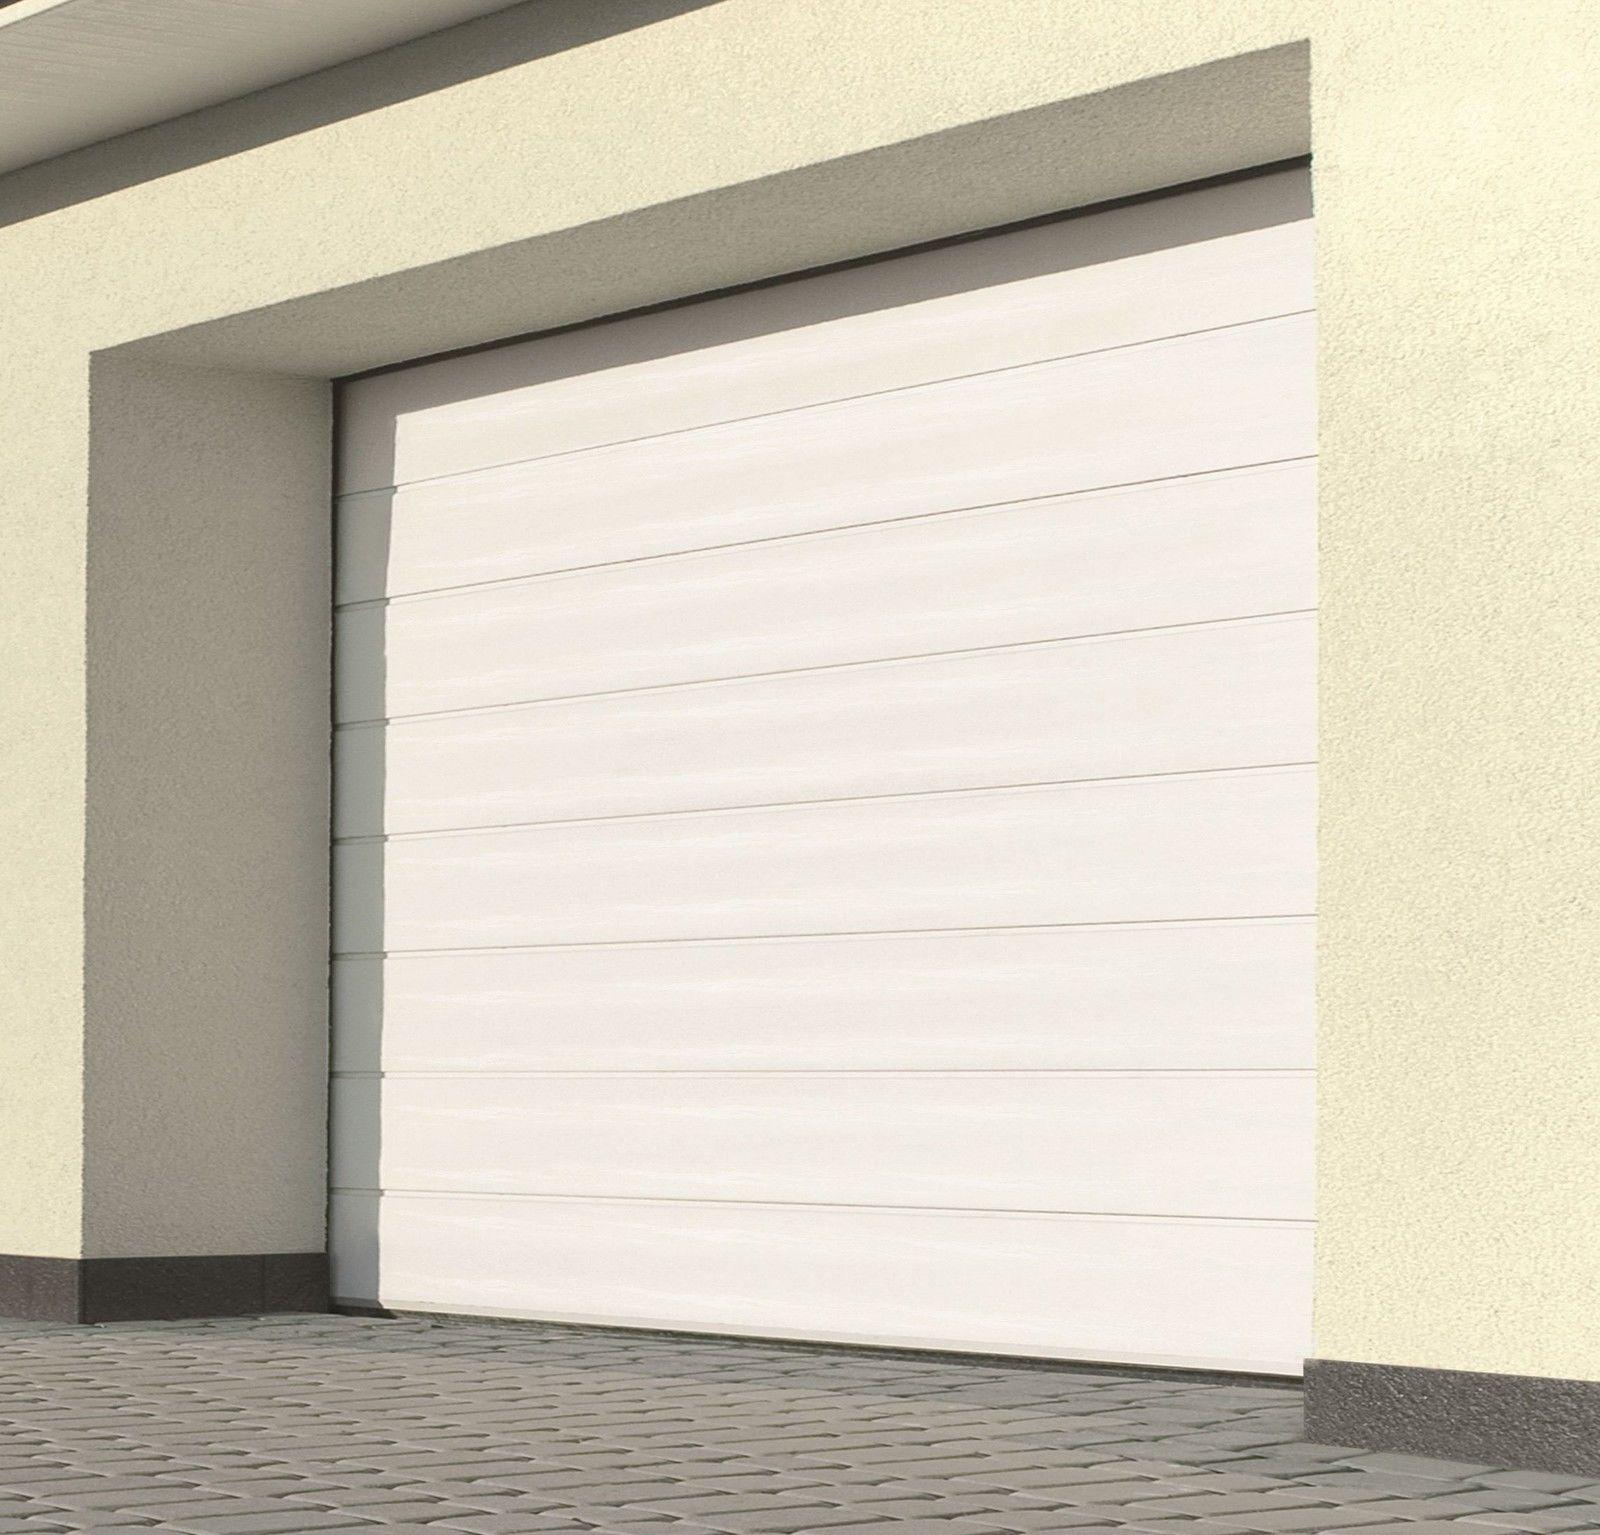 garagentor sektionaltor hori thermo40 ml sicke woodgrain zarge antrieb sender ebay. Black Bedroom Furniture Sets. Home Design Ideas